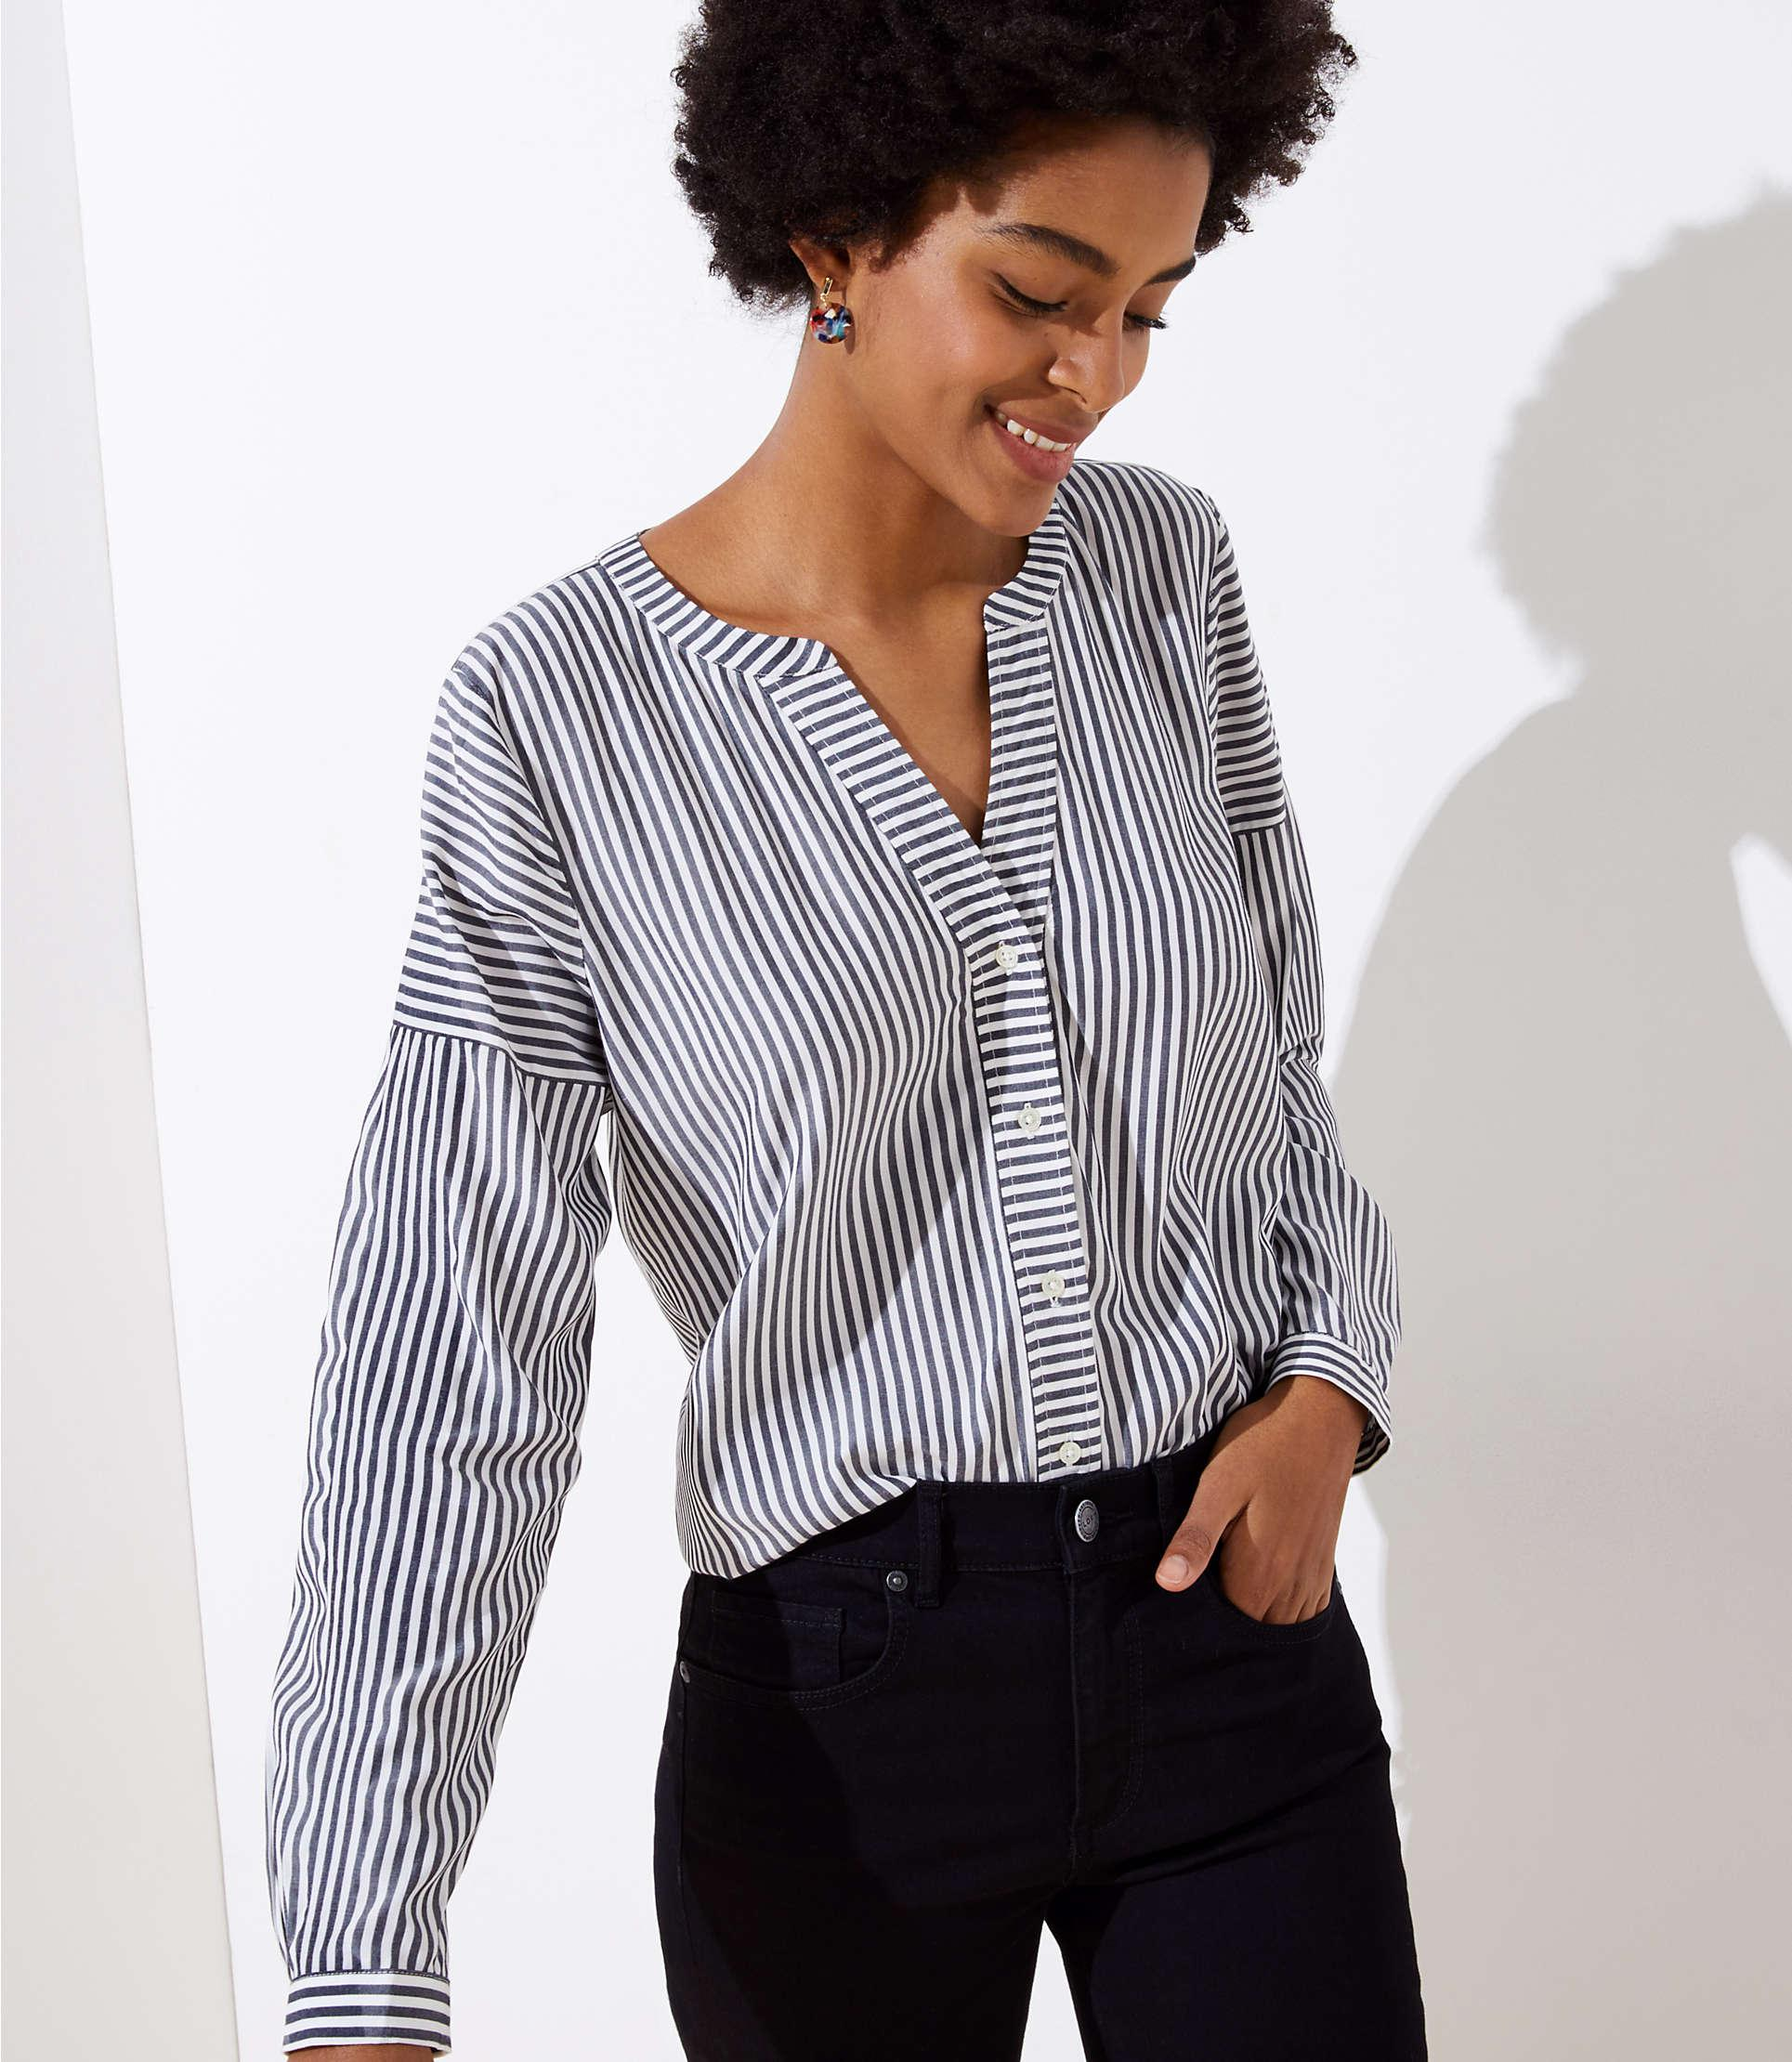 b2f92e4bda713d Lyst - LOFT Petite Mixed Stripe Split Neck Shirt in White - Save 42%